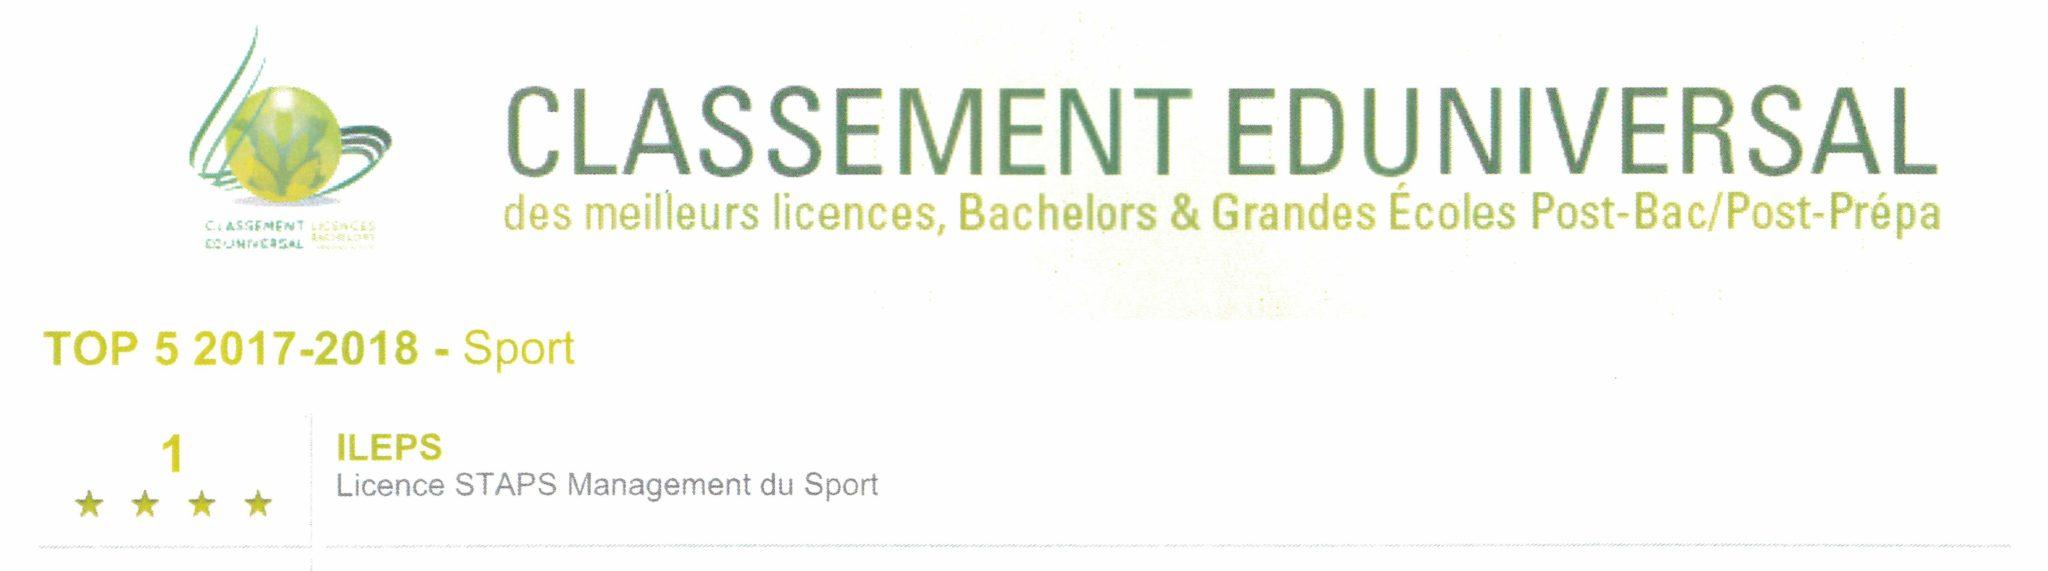 Eduniversal 2018 Licence STAPS Classement